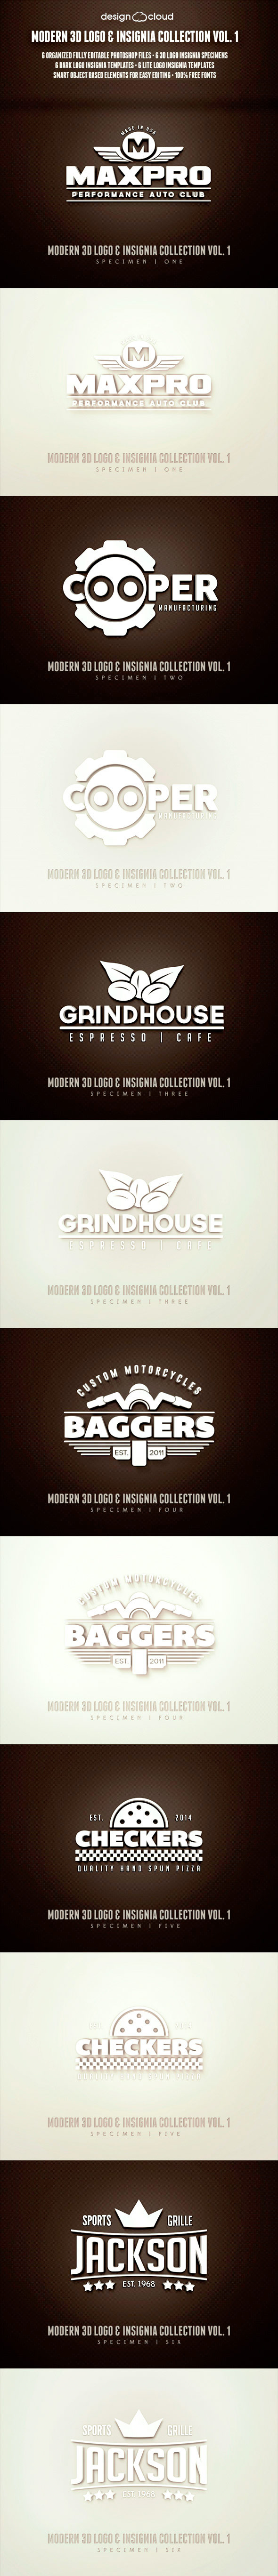 Modern 3D Logo, Insignia & Badge Templates Vol. 1